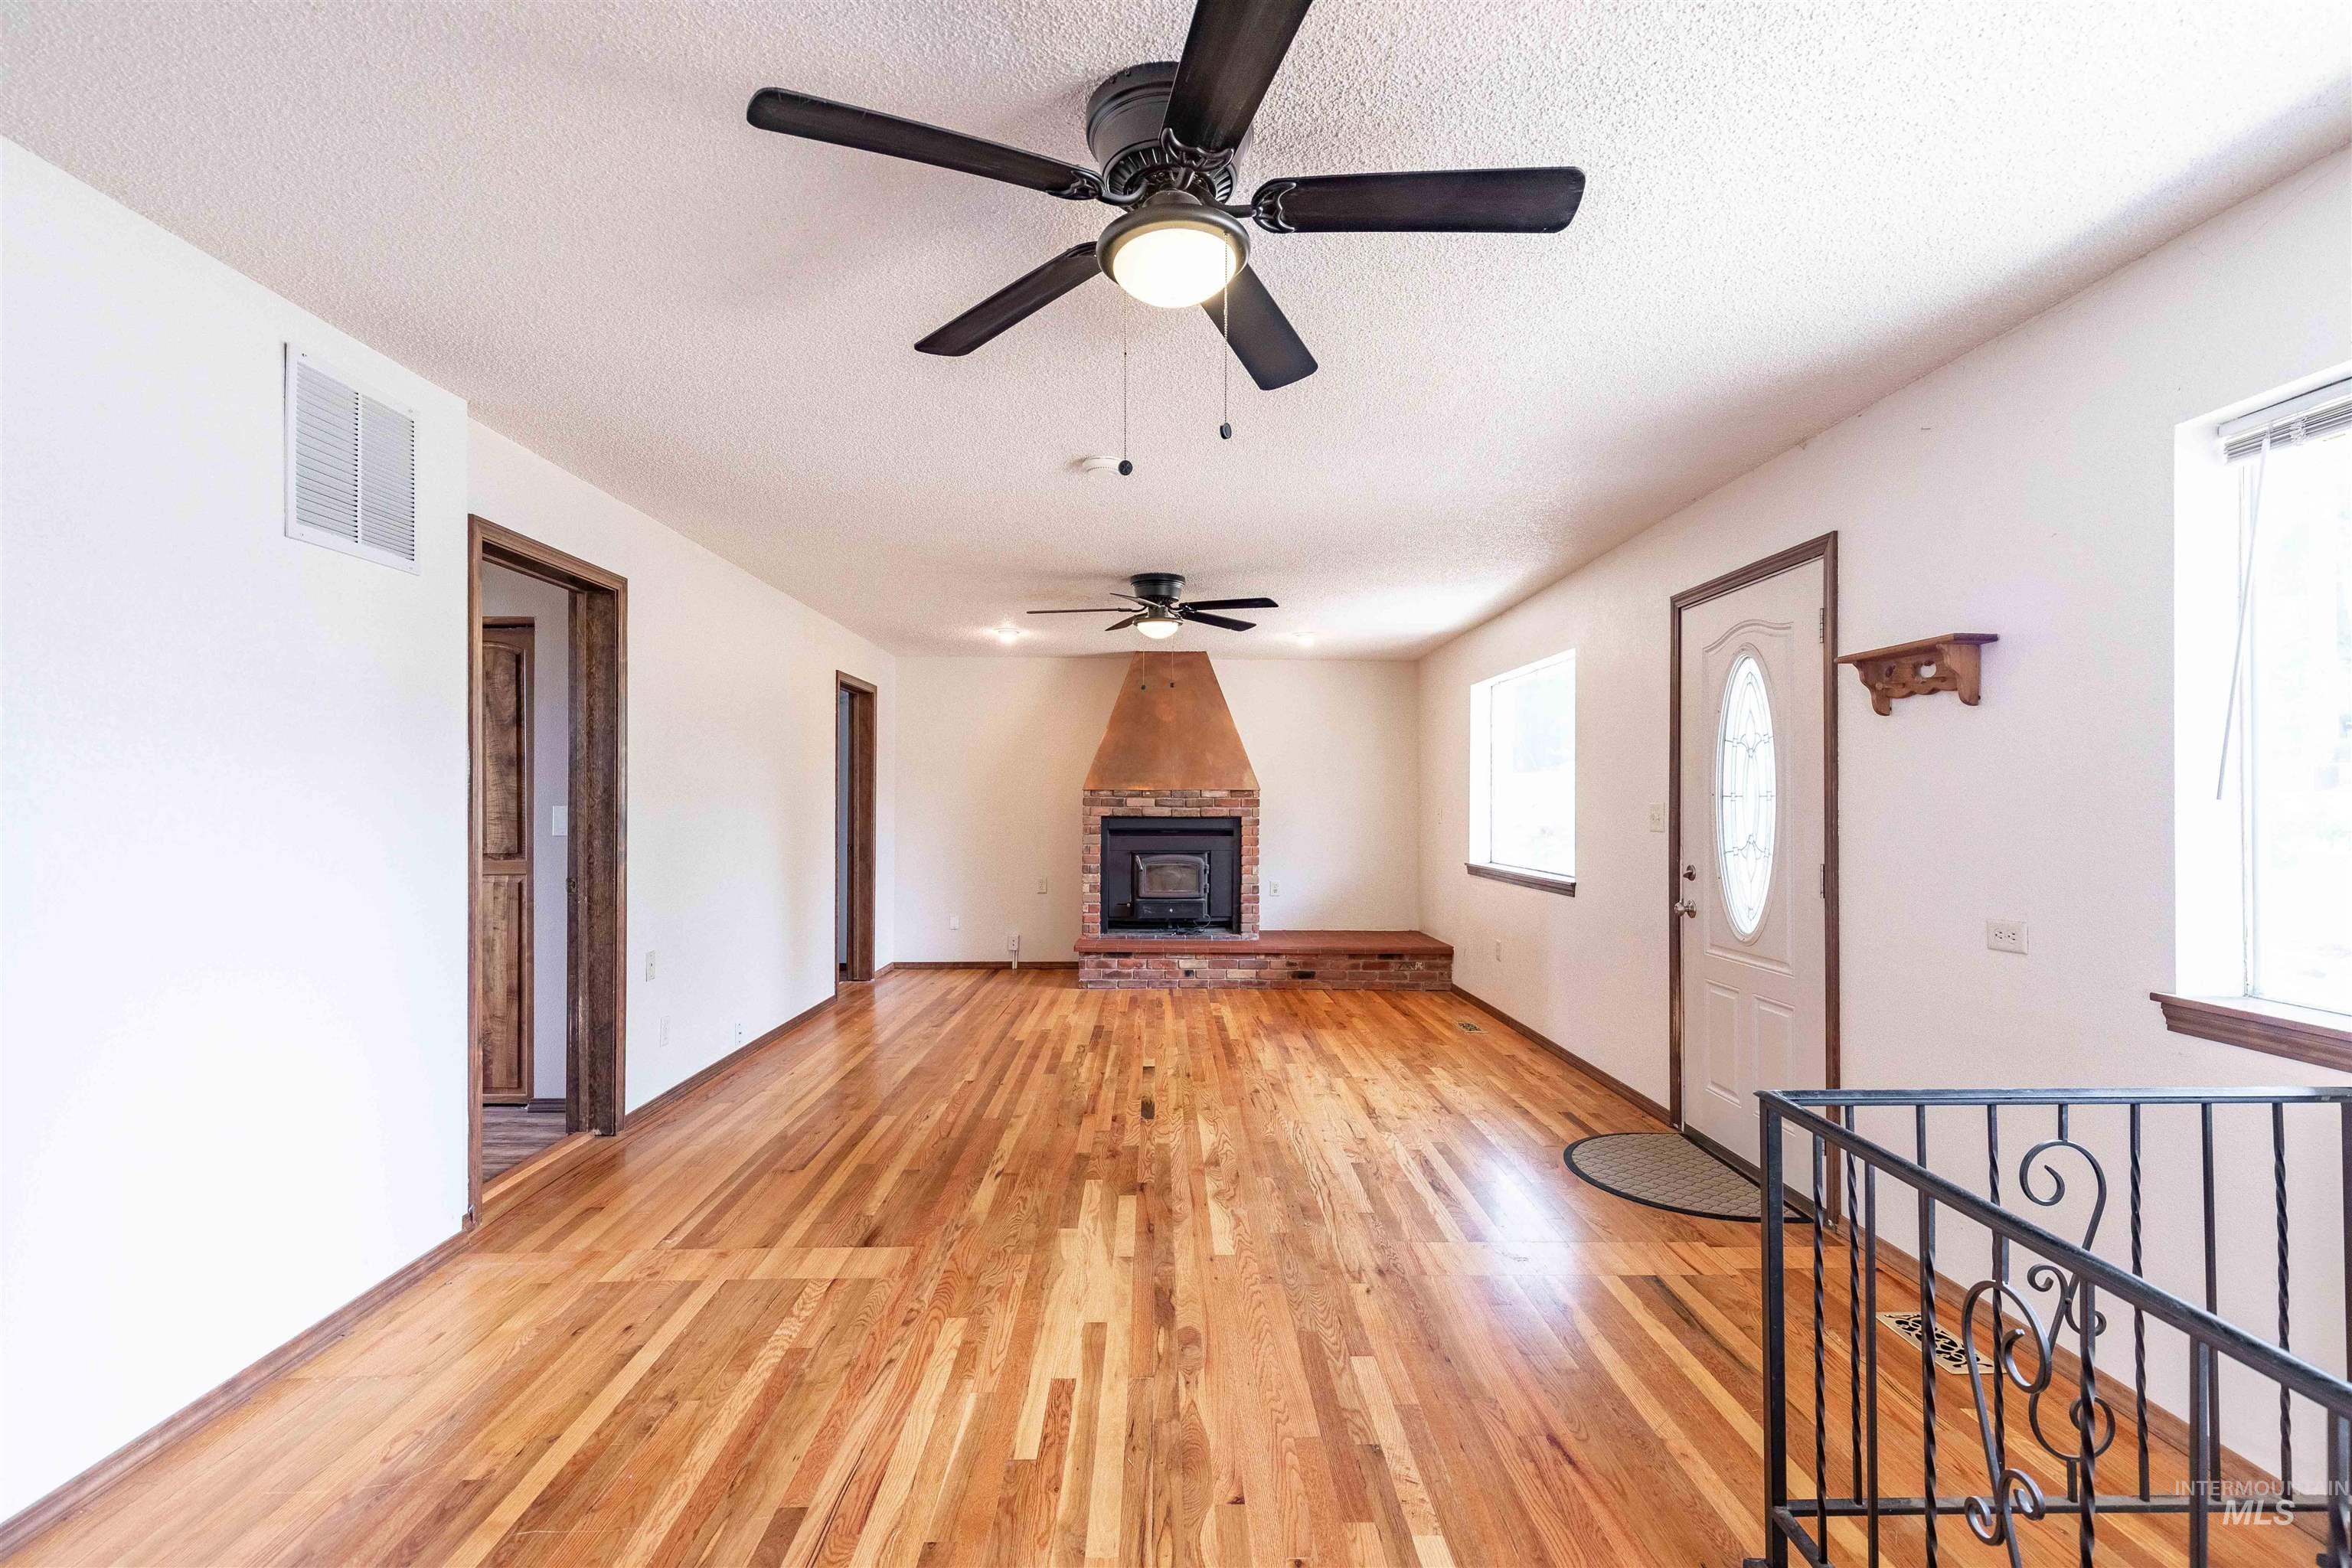 346 N Jackson Property Photo 7